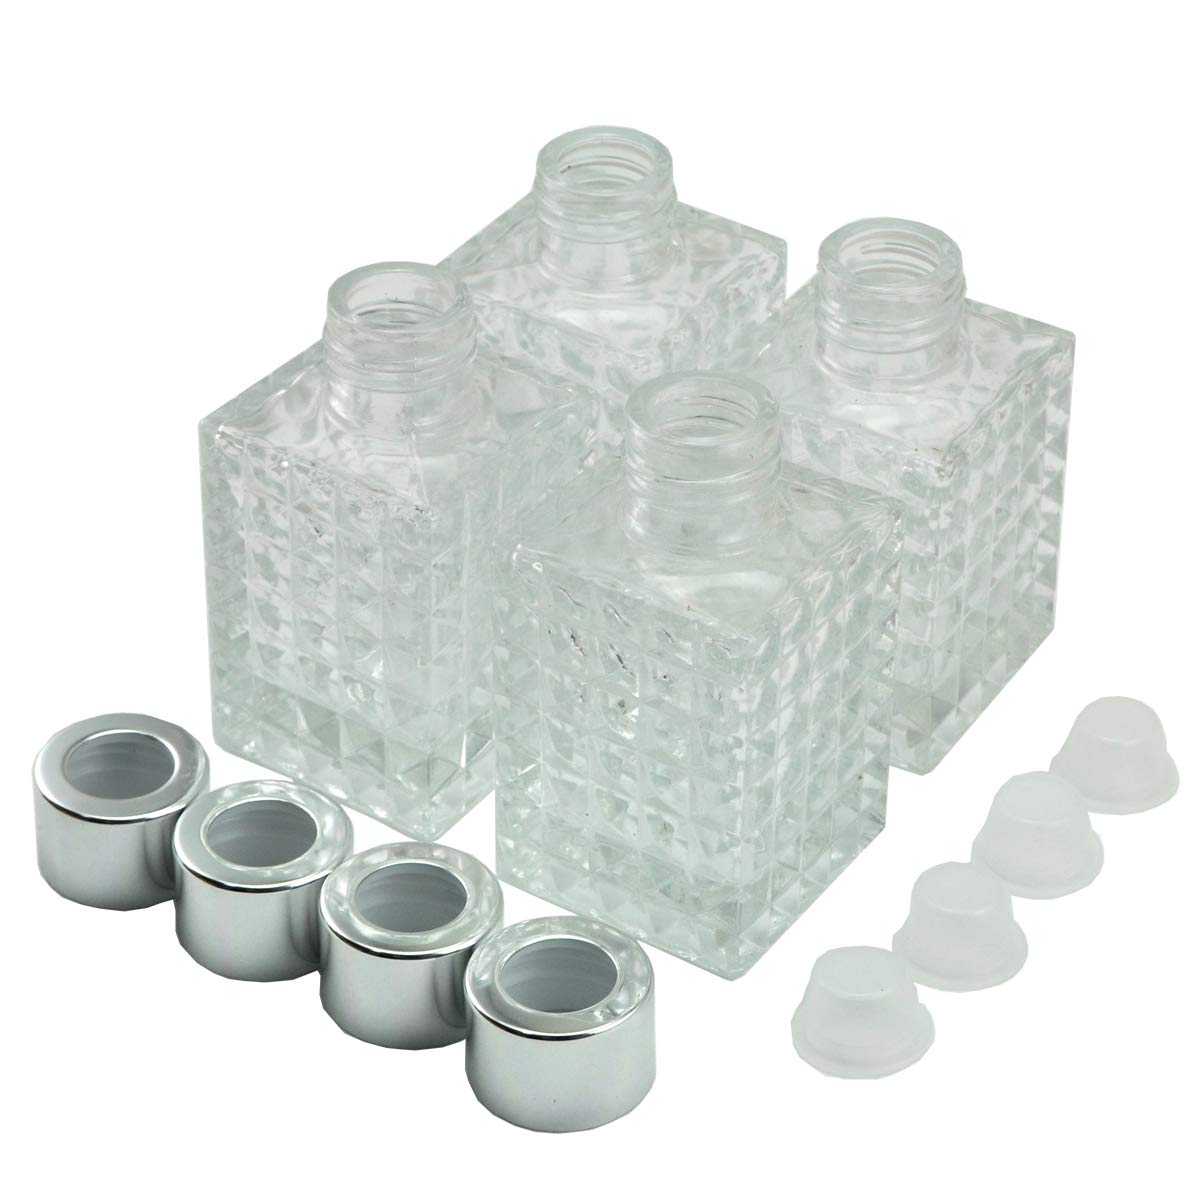 8872de565991 Ougual Set of 4 Square Glass Essential Oils Diffuser Bottles (100ML, Gold  Caps)